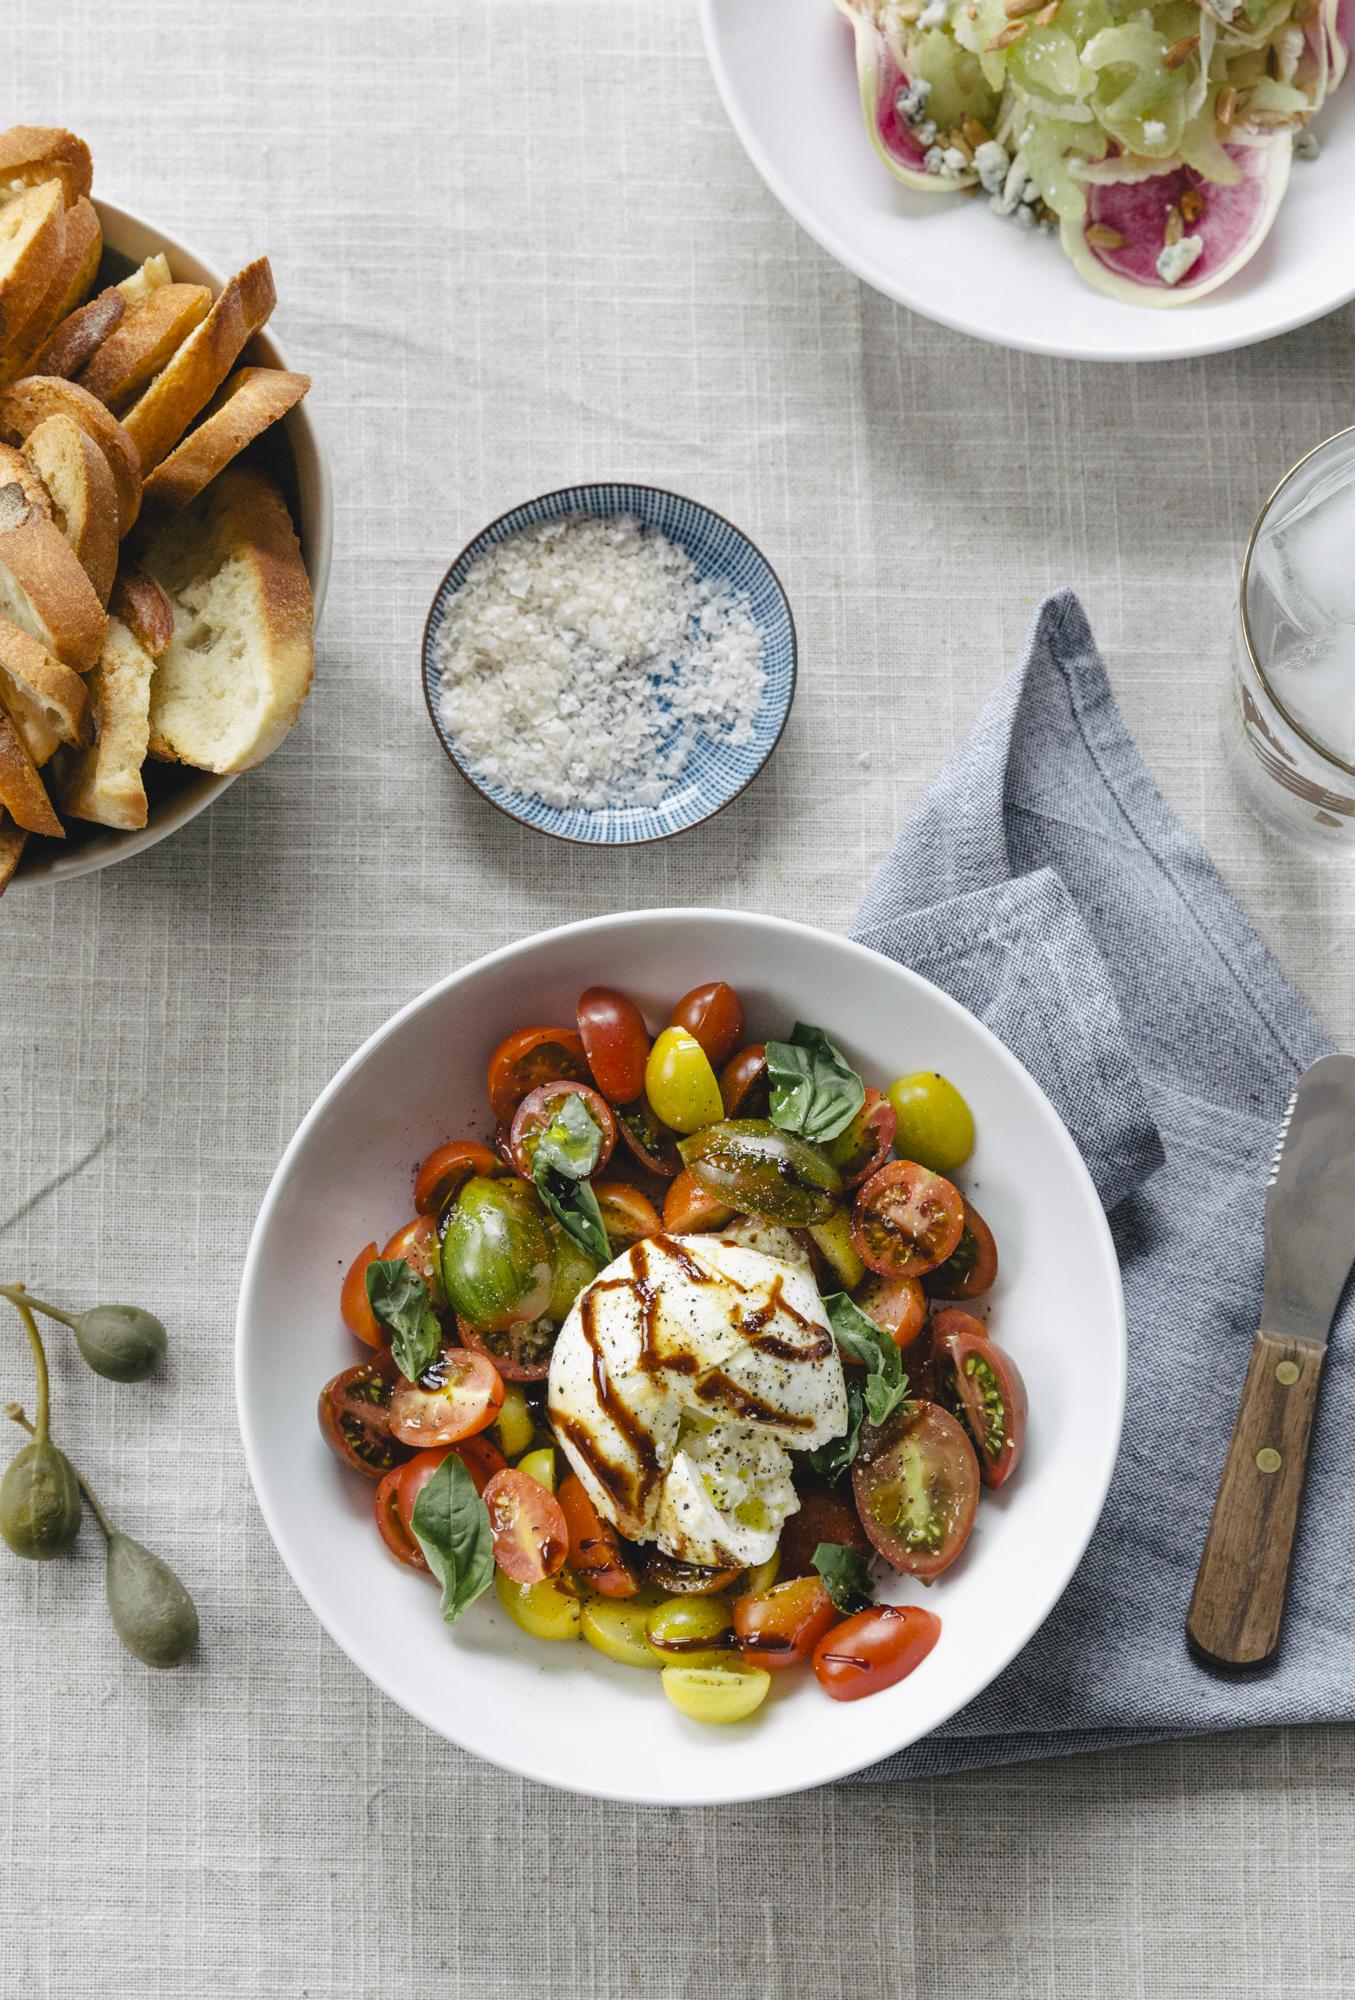 Heirloom Tomatoes & Burrata